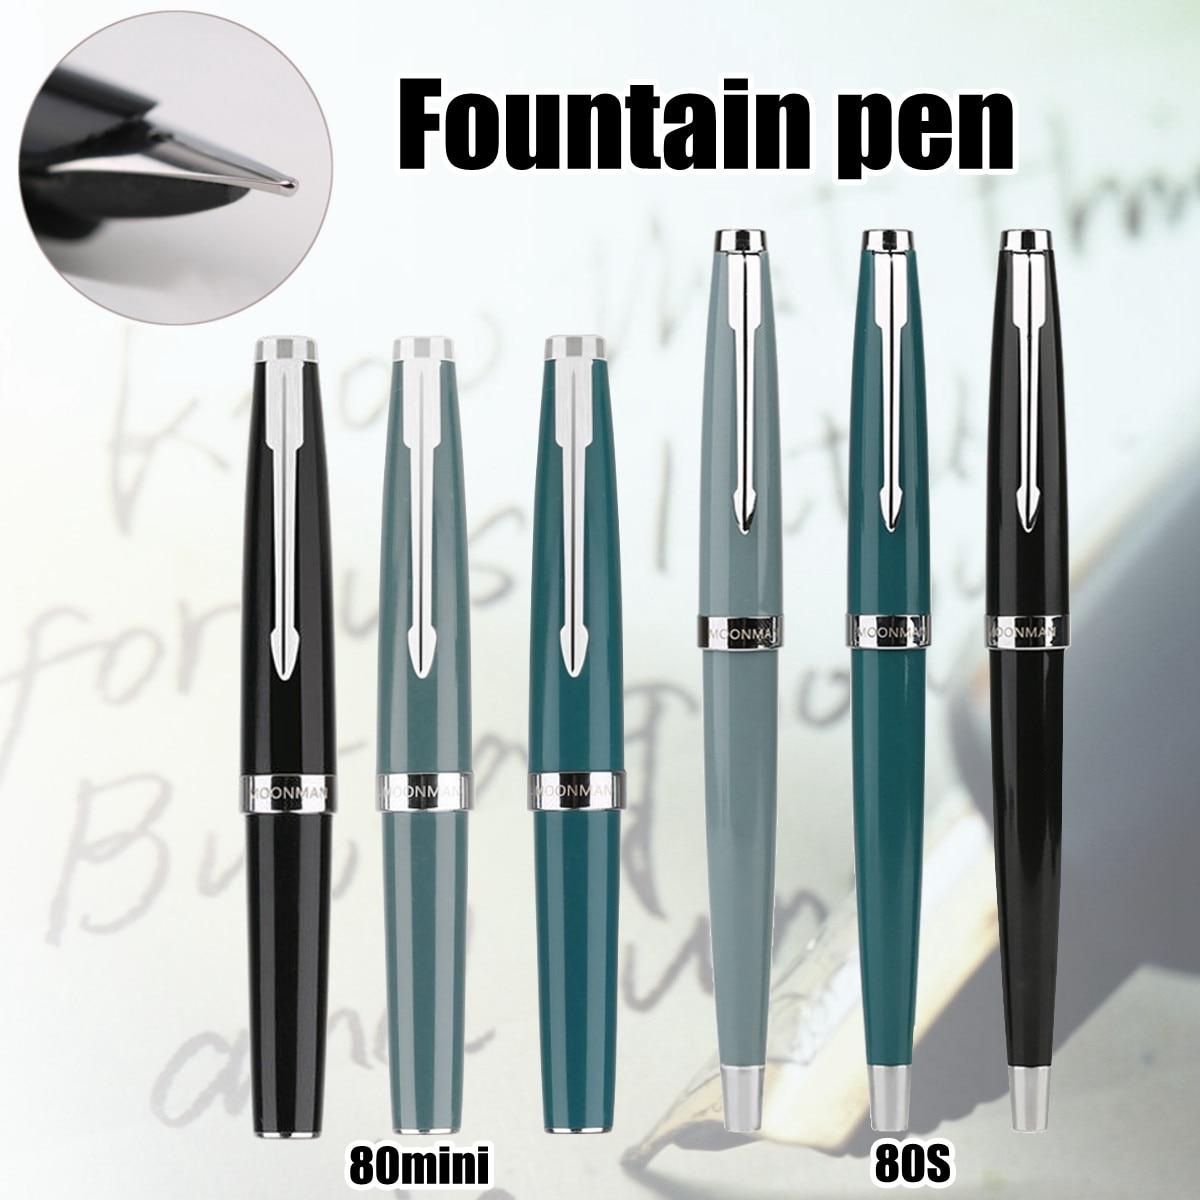 MOONMAN 80s 80 MINI Pocket Fountain Pen Fine Nib Find Classic Series Pen Fountain Pen genium hero 100 pen total steeless 14k golden fine nib fountain pen